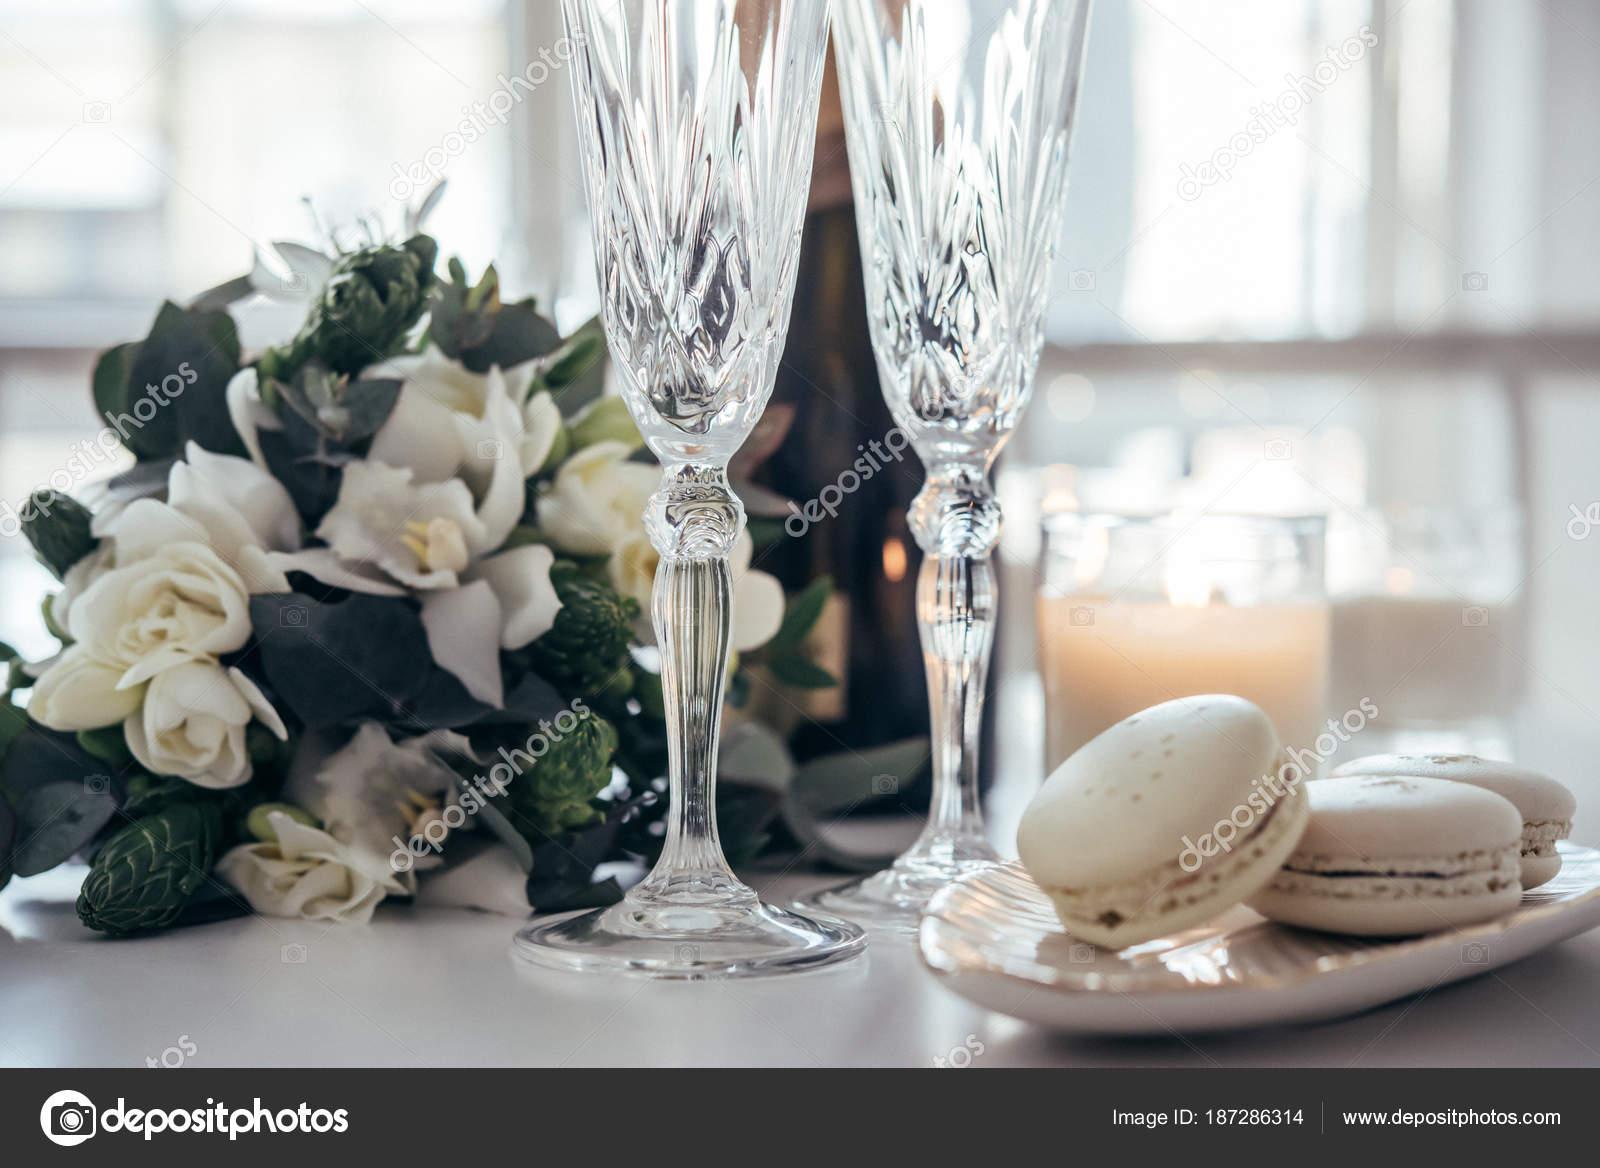 Krasne Svatebni Dekorace S Sampanskym A Kvetiny Elegantni Stock